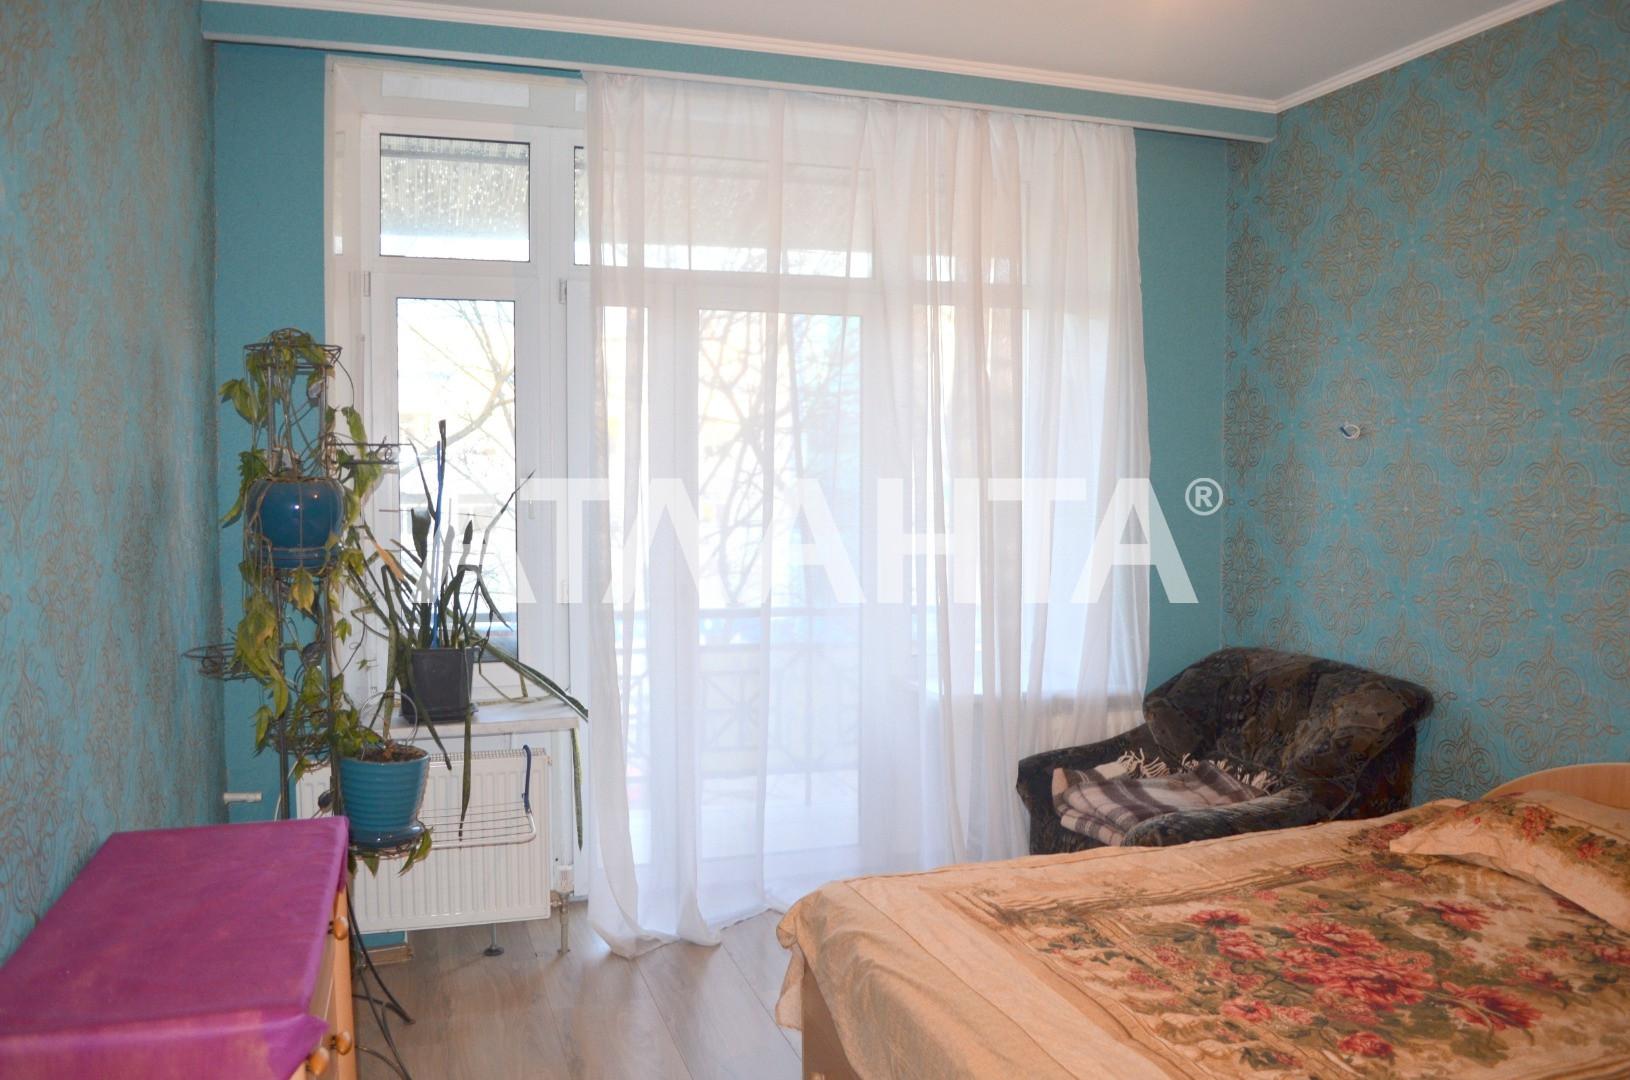 Продается 3-комнатная Квартира на ул. Французский Бул. (Пролетарский Бул.) — 98 000 у.е. (фото №4)